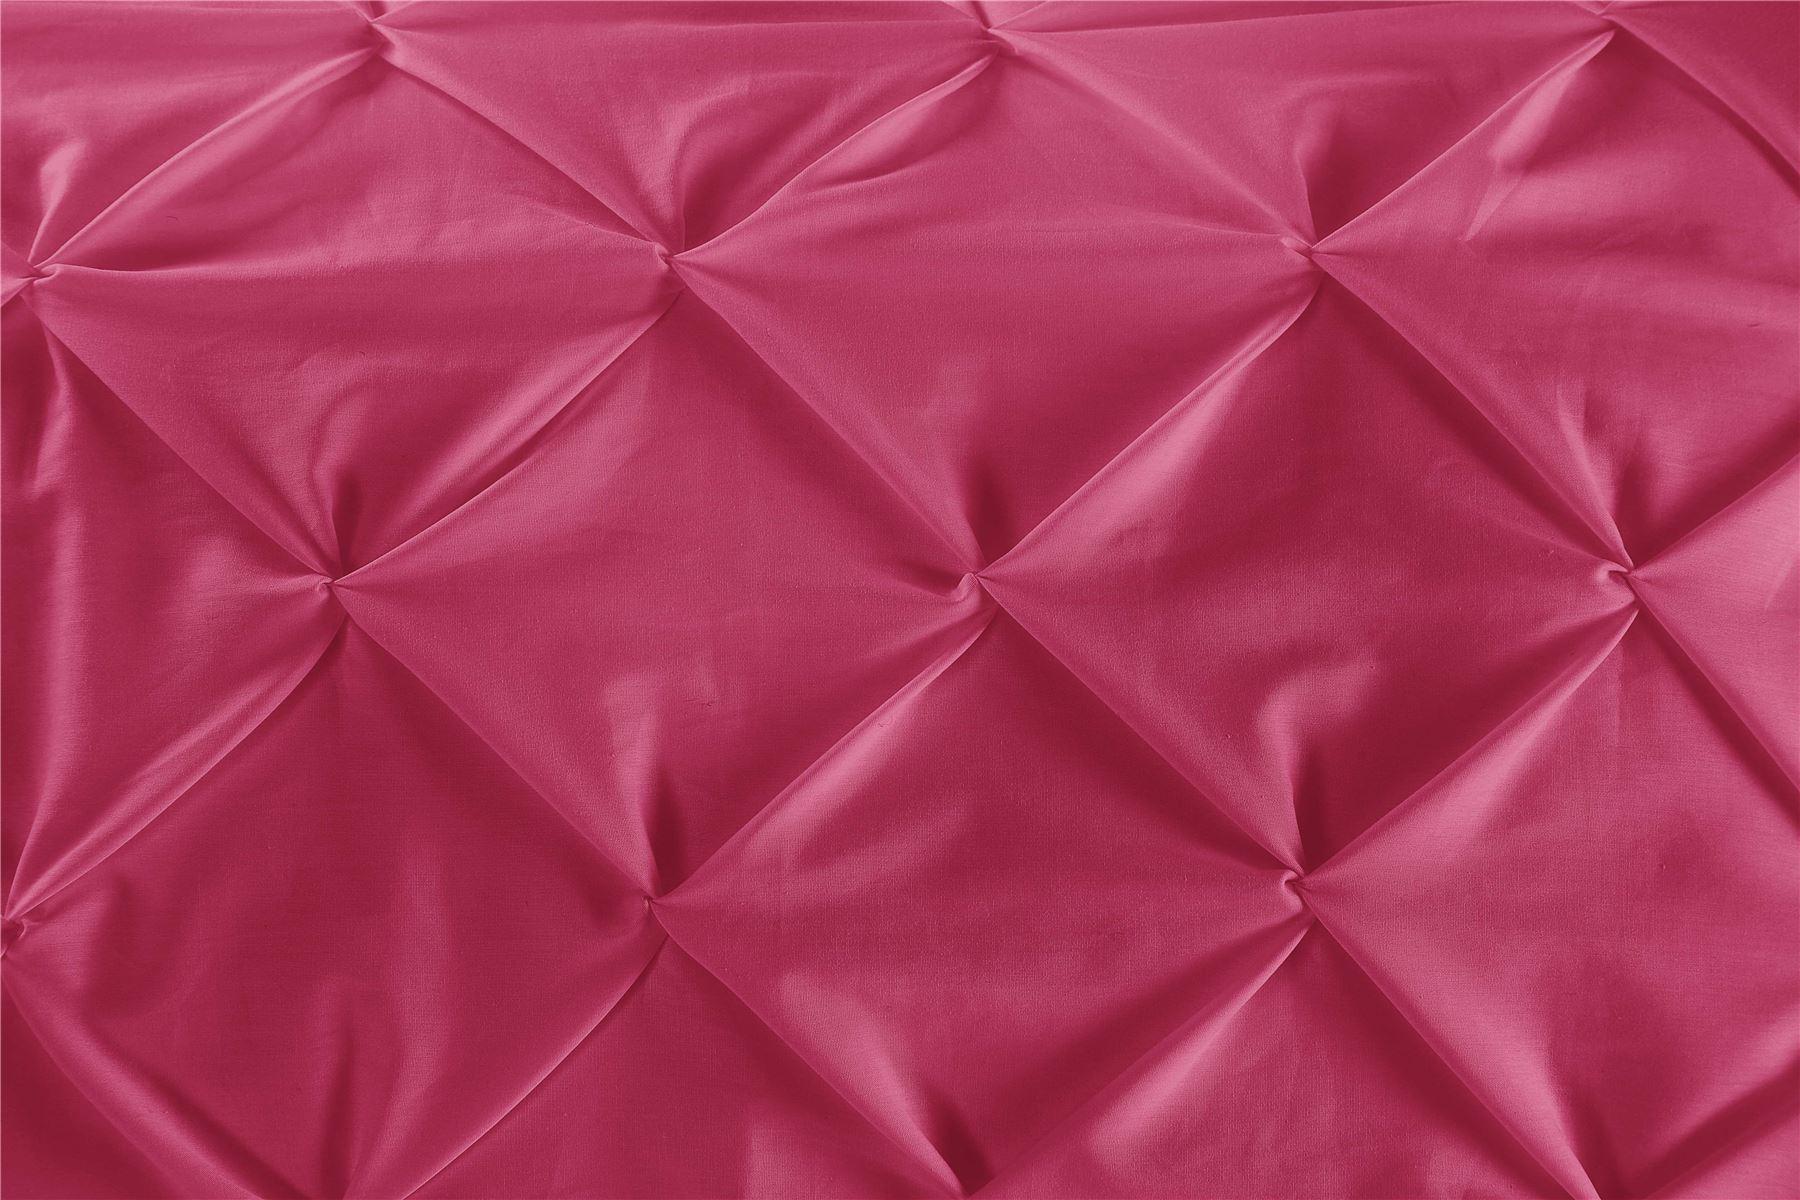 Luxury-Pure-100-Cotton-200-Thread-Pinch-Pleat-Pintuck-Puckering-Duvet-Cover-Set thumbnail 36